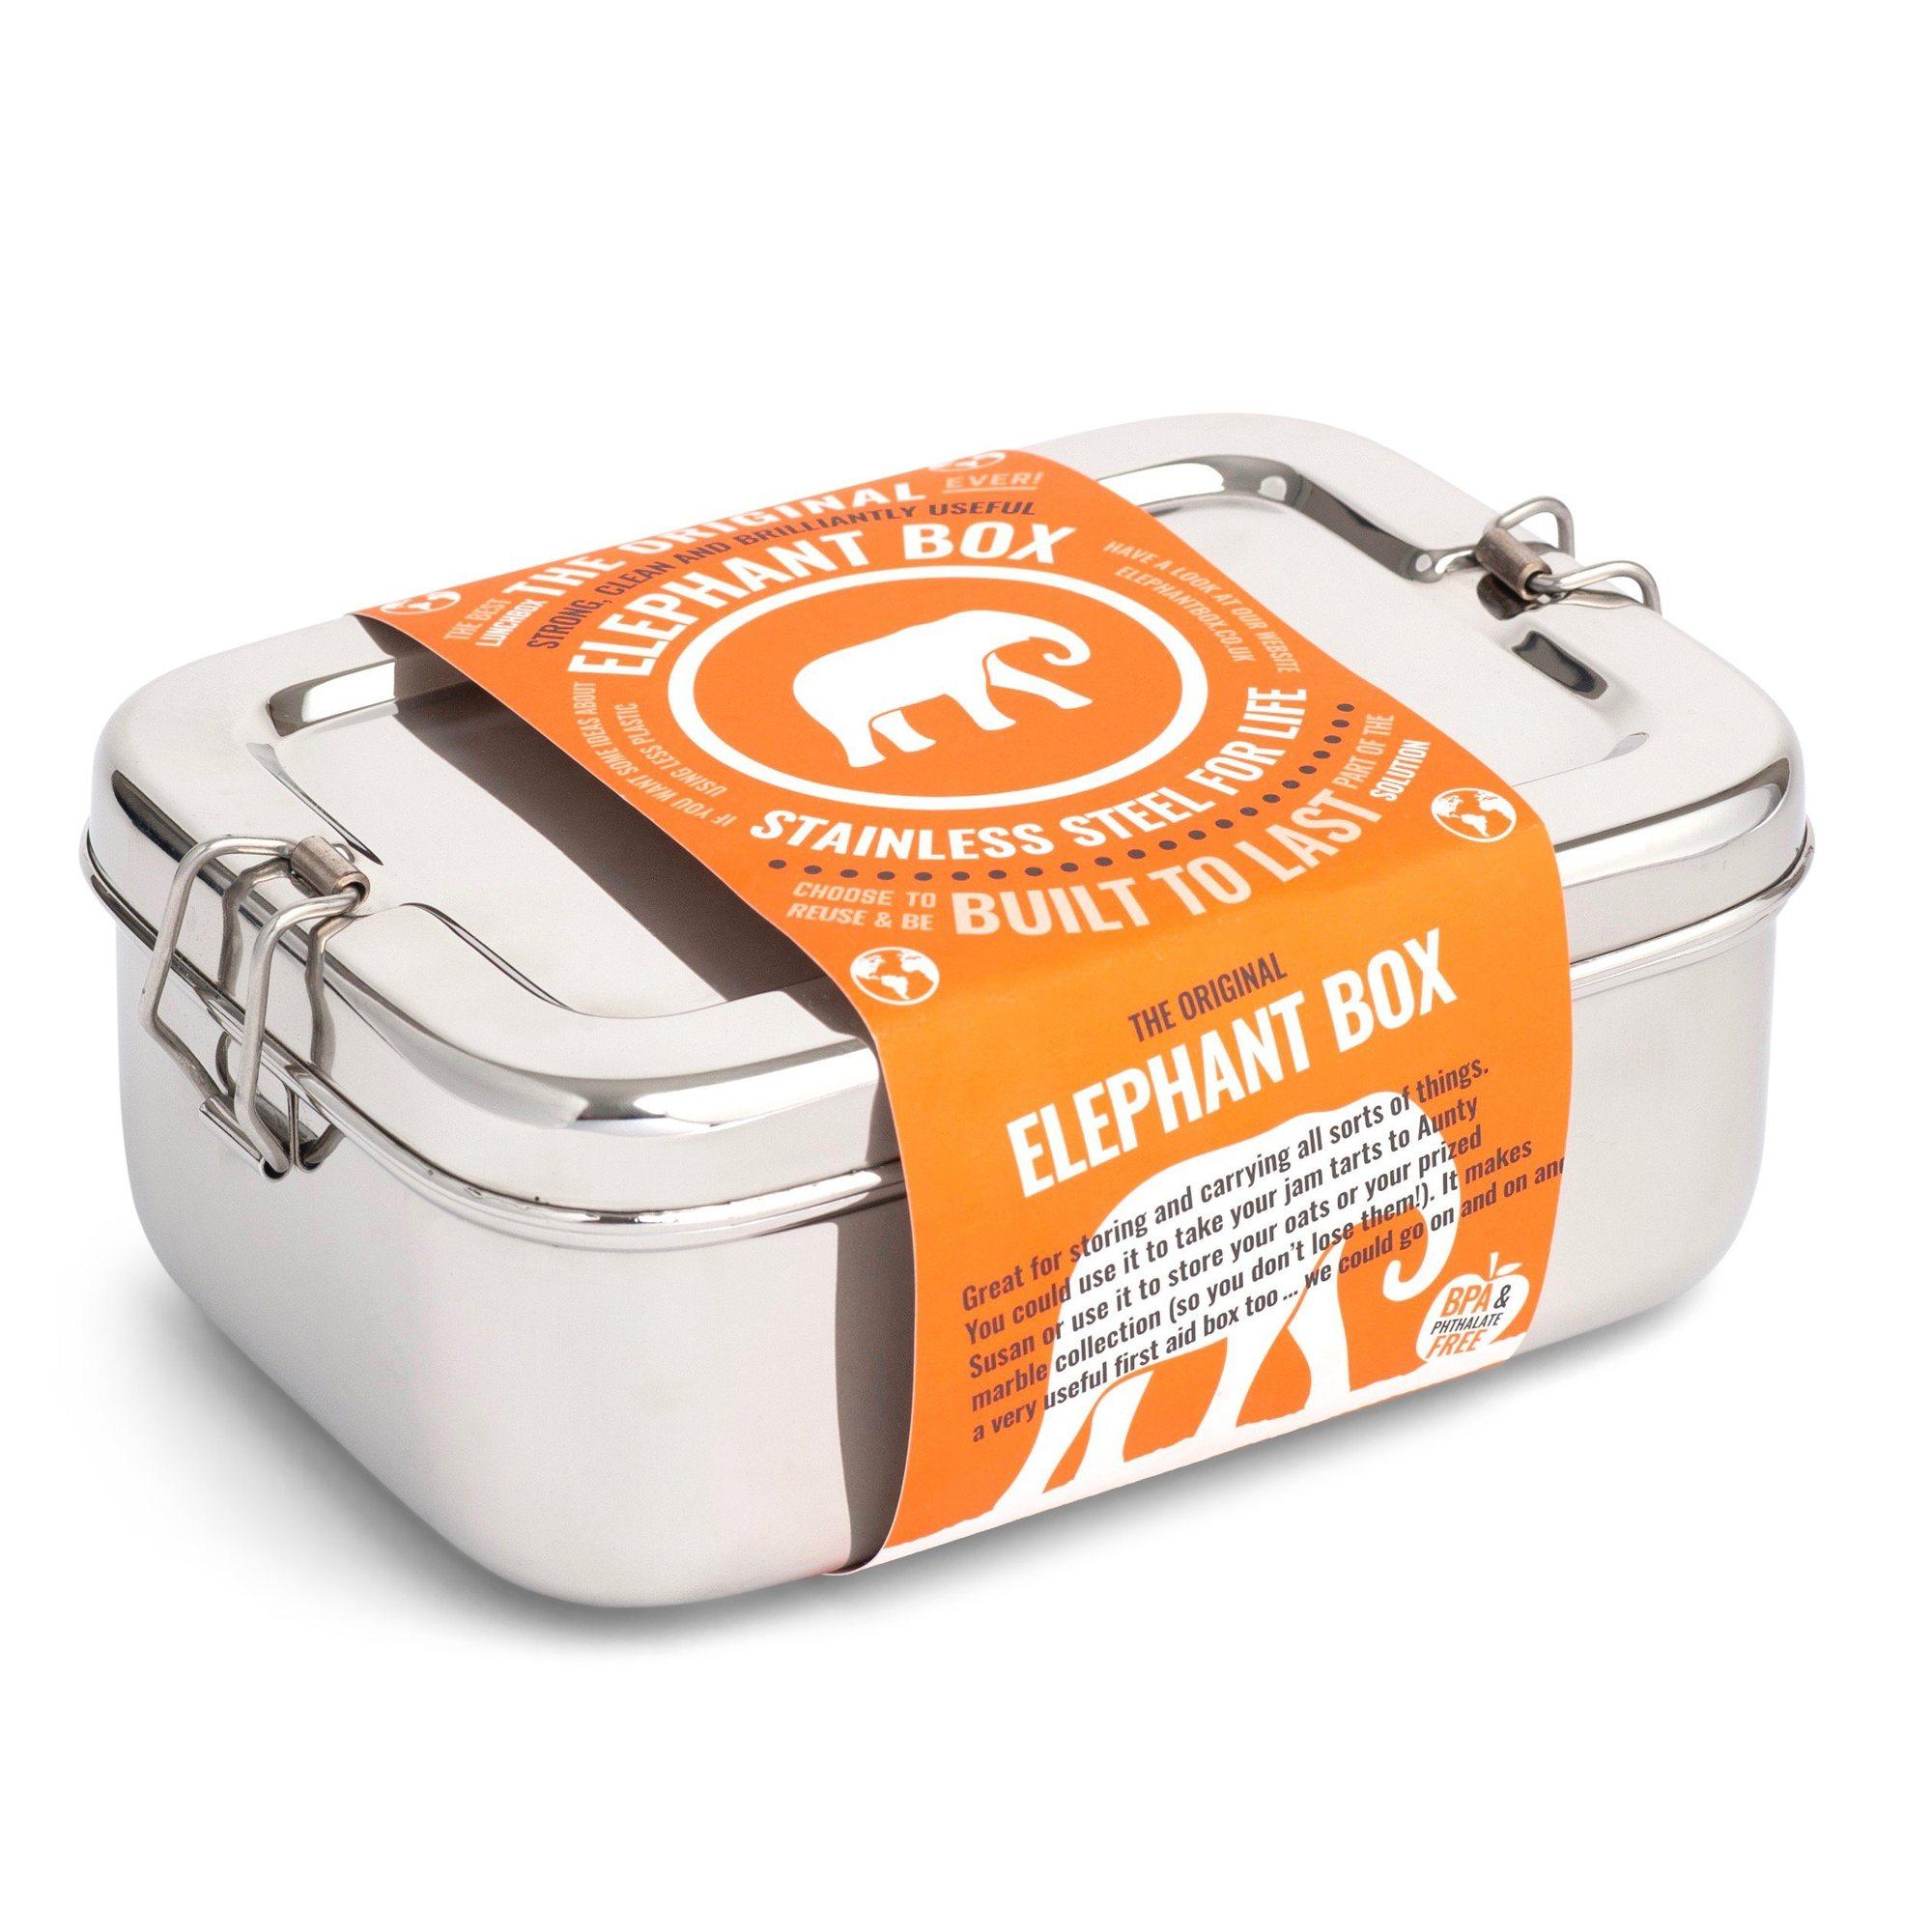 Elephant Box Lunchbox